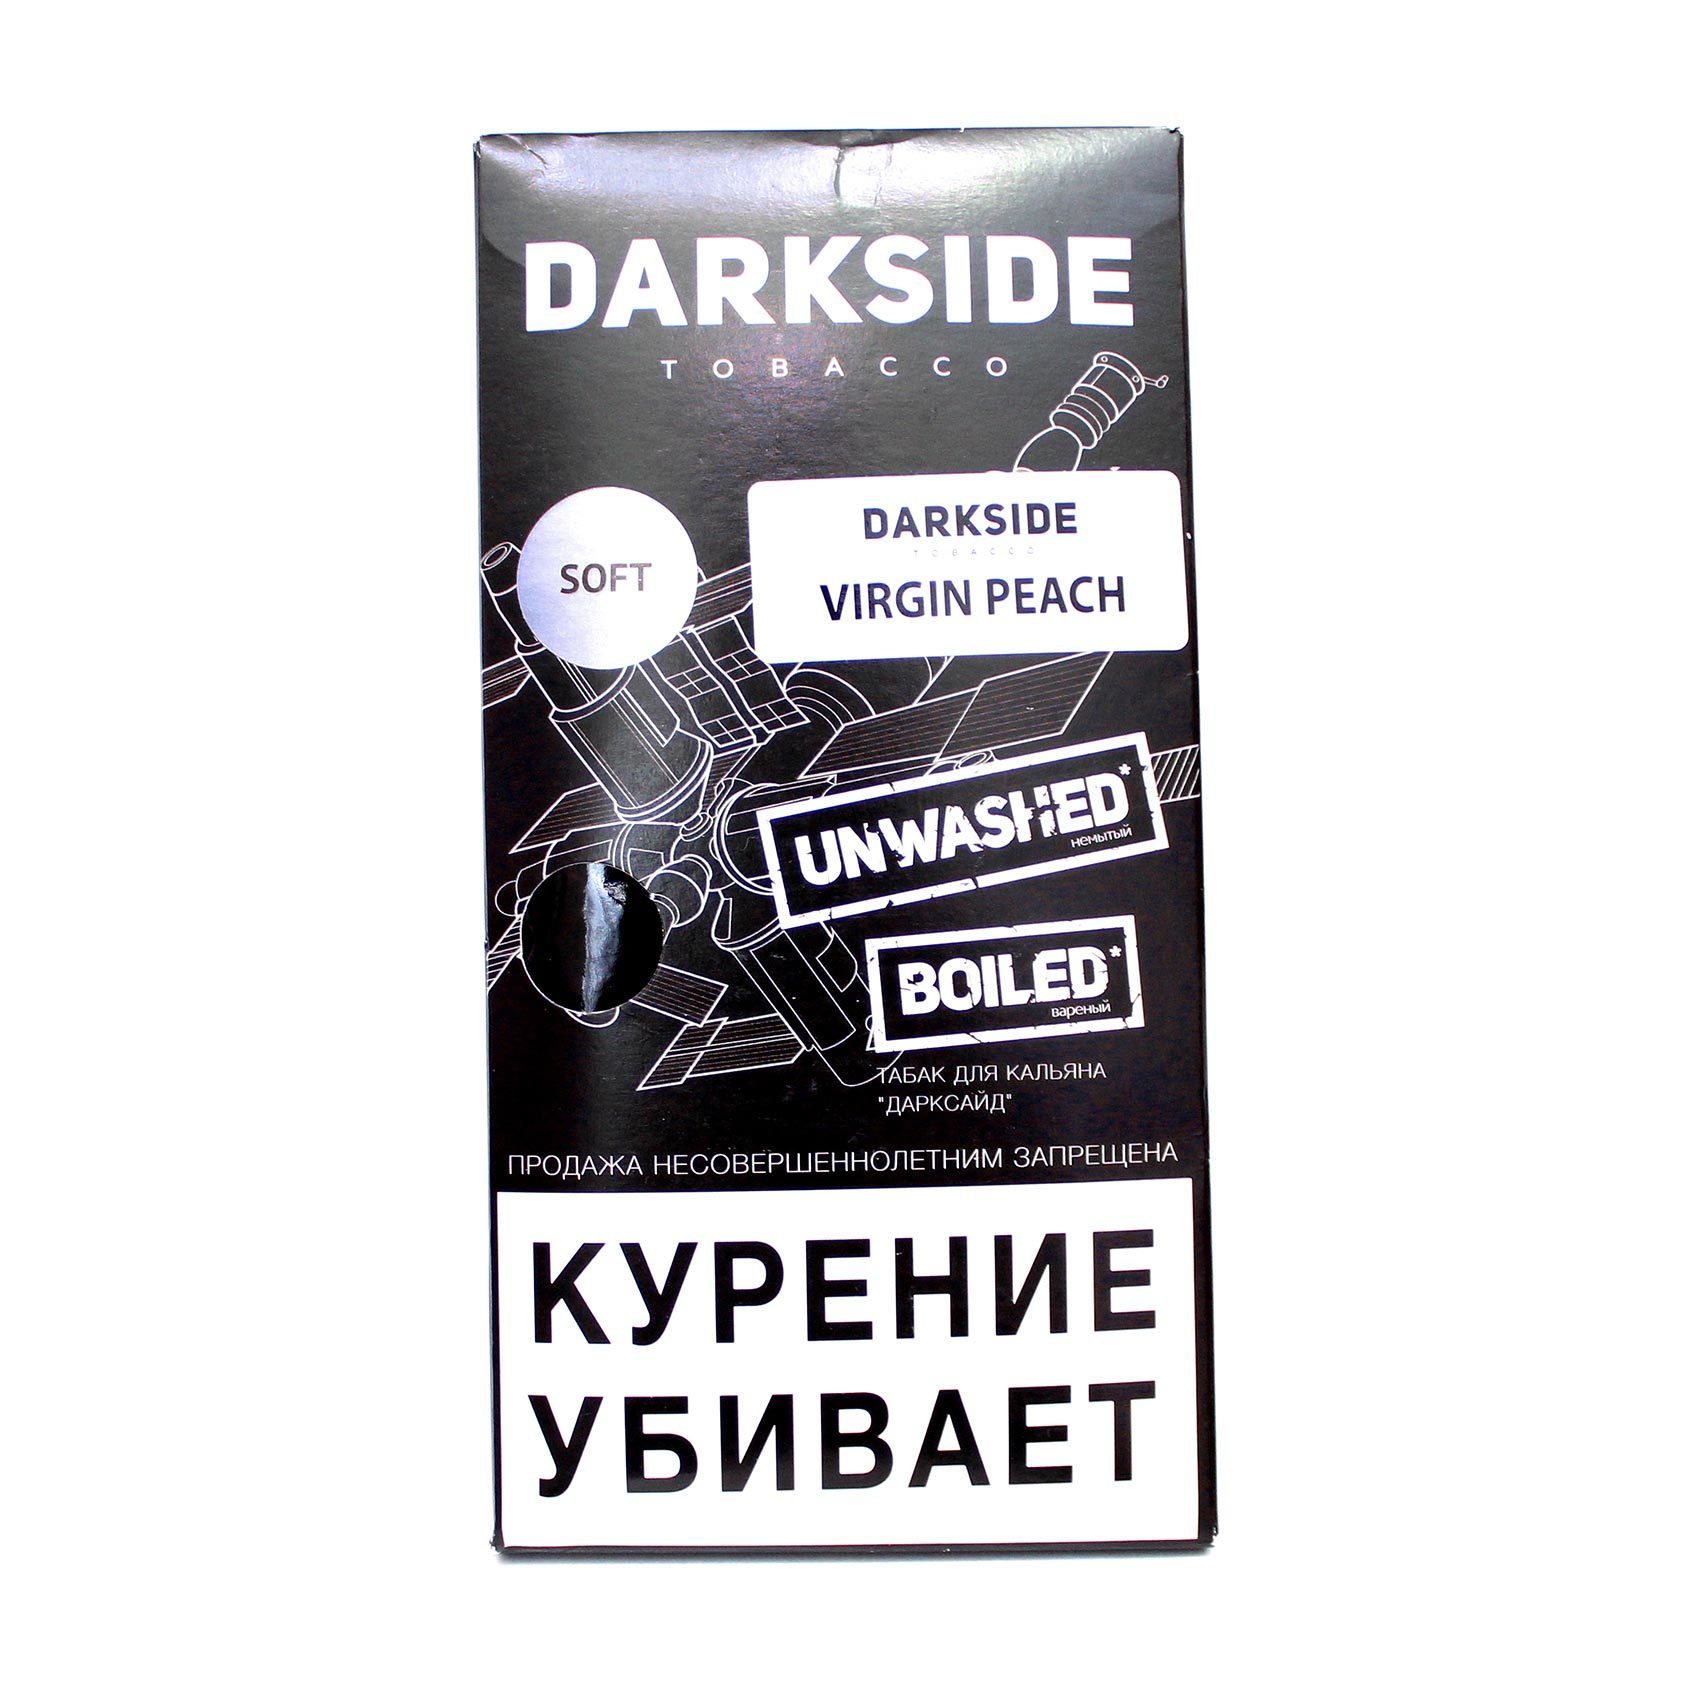 Табак для кальяна Dark Side Soft 250 гр. Virgin Peach